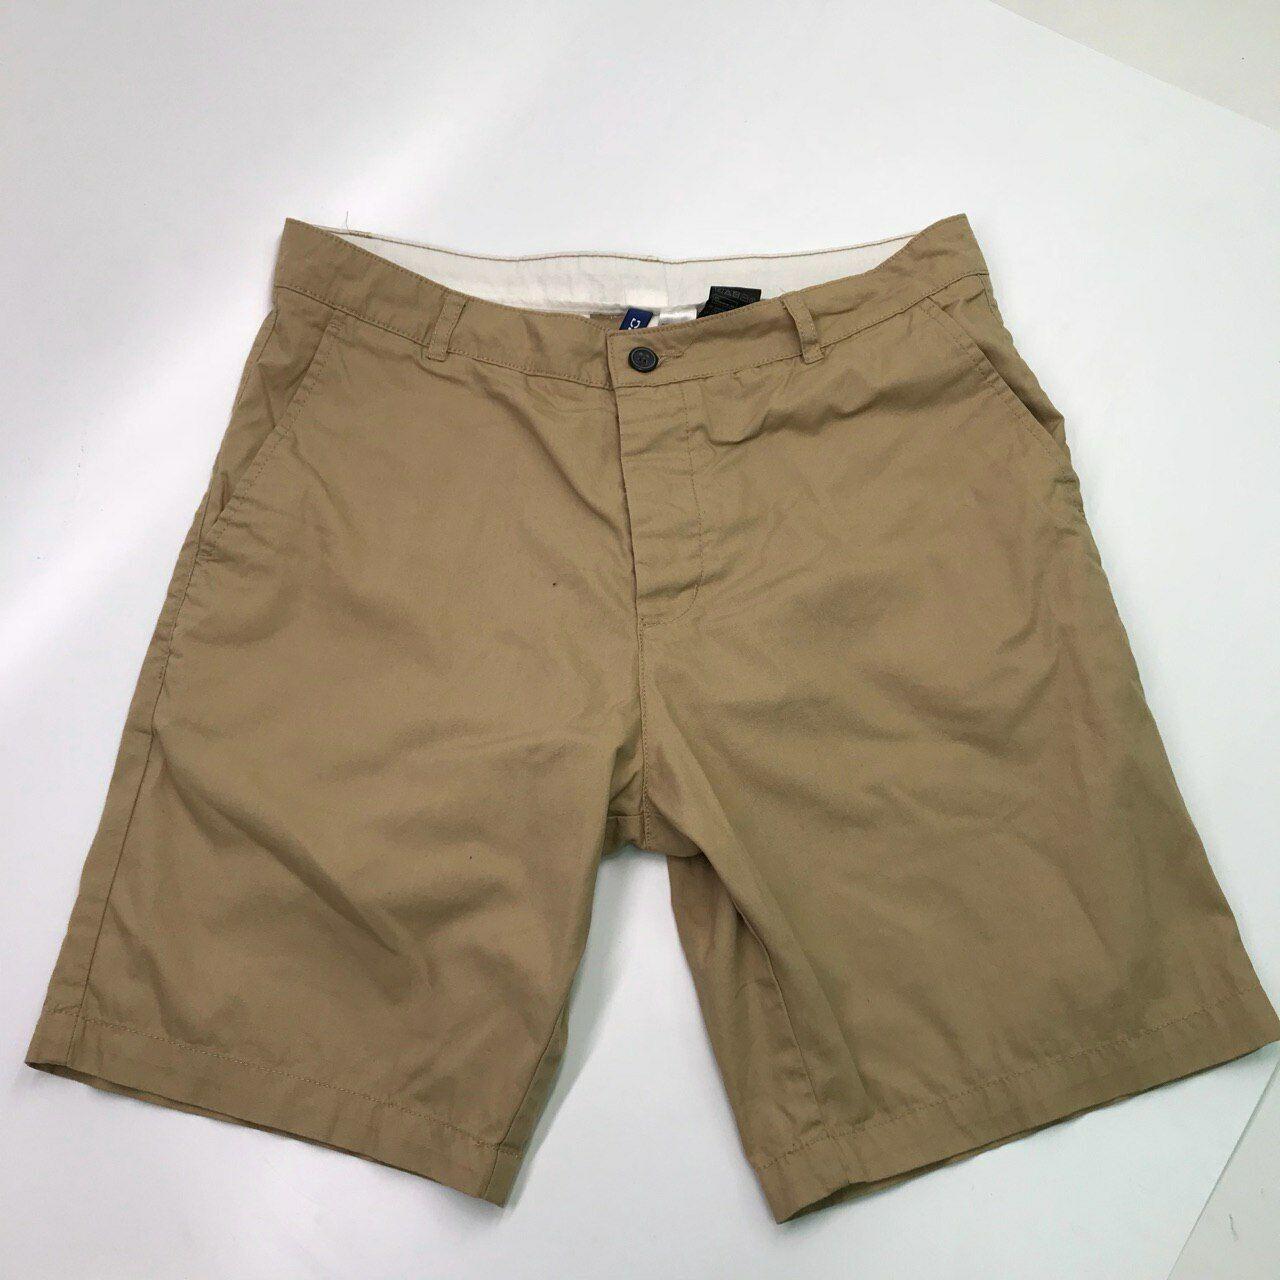 H&M DIVIDED Beige Men's Shorts Size 32